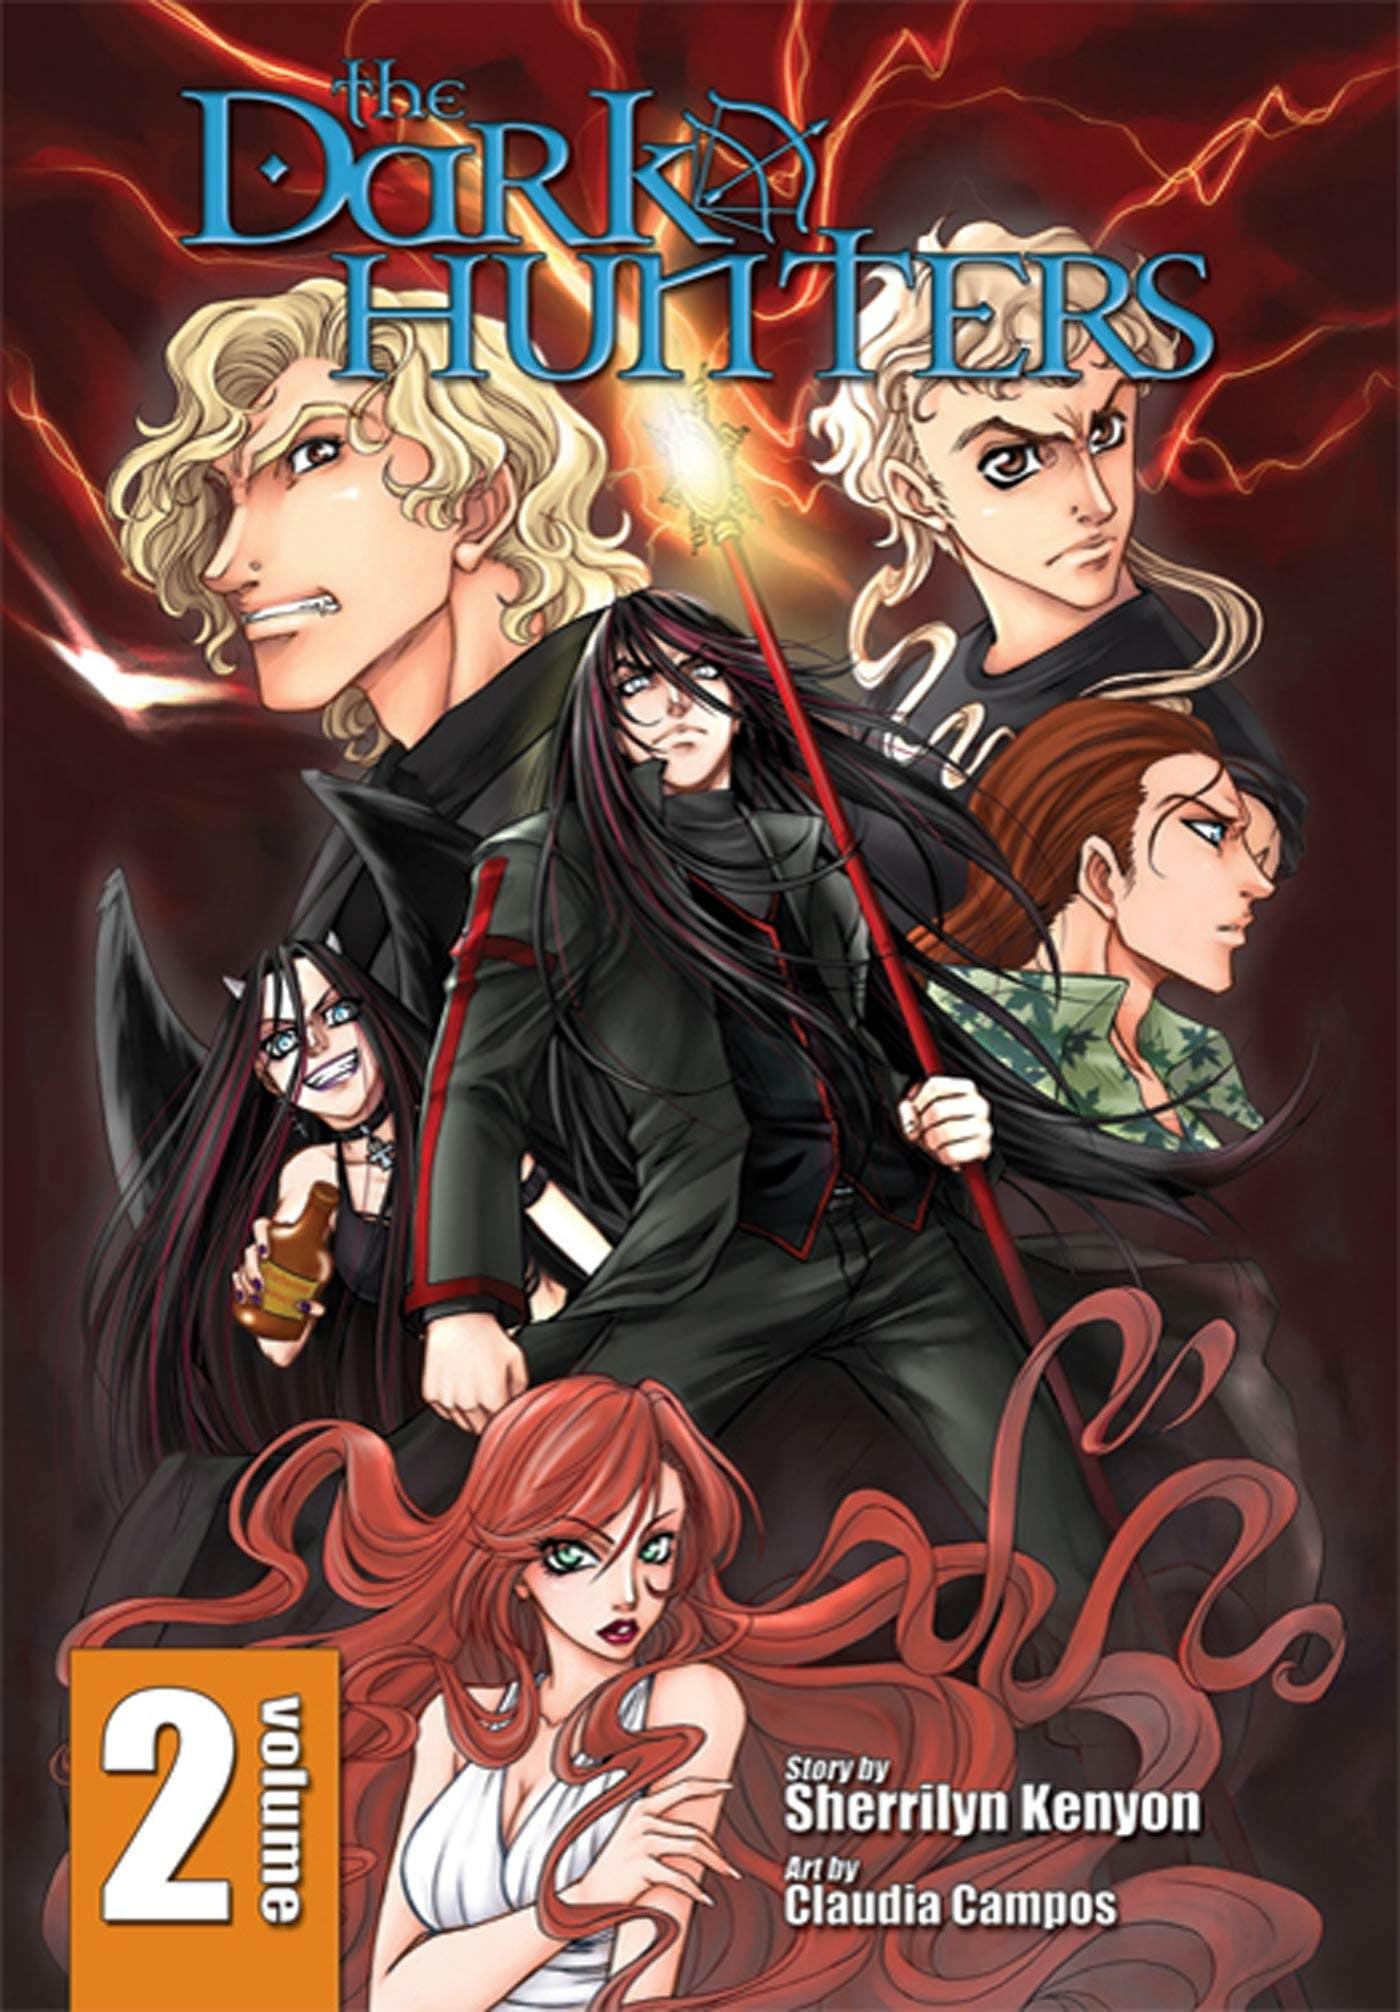 Image of The Dark-Hunters, Vol. 2